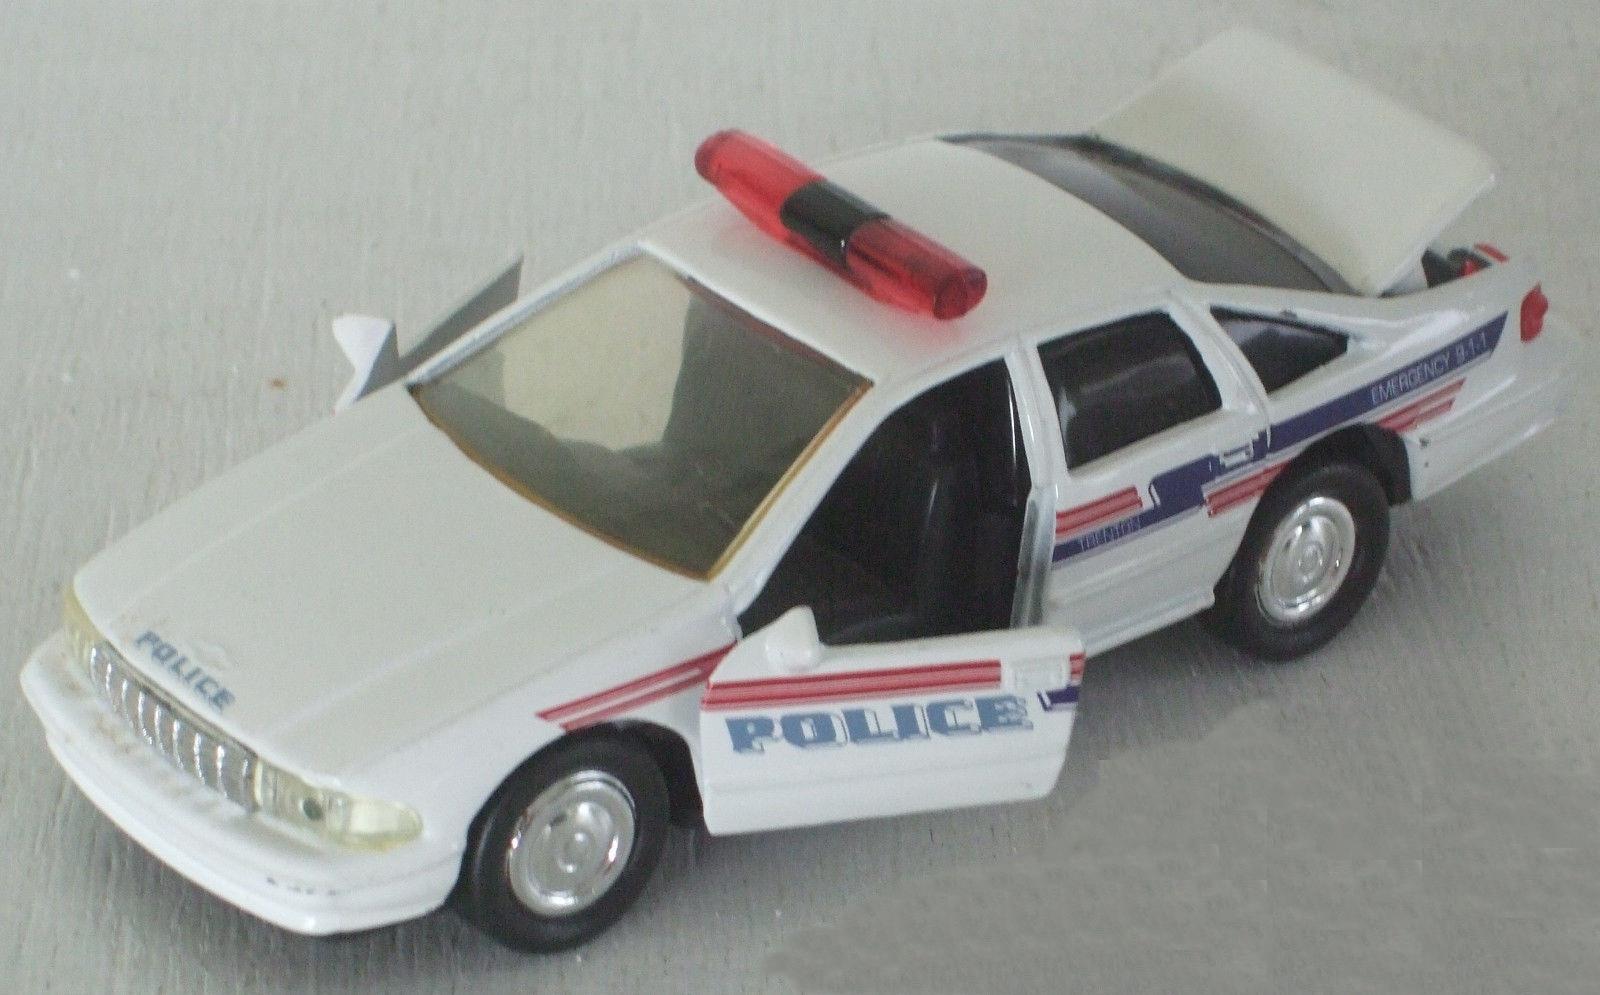 Model Vehicles Cars Trucks Convertibles Civilian Precision 1951 Chevrolet Police Car 895 1998 Chevy